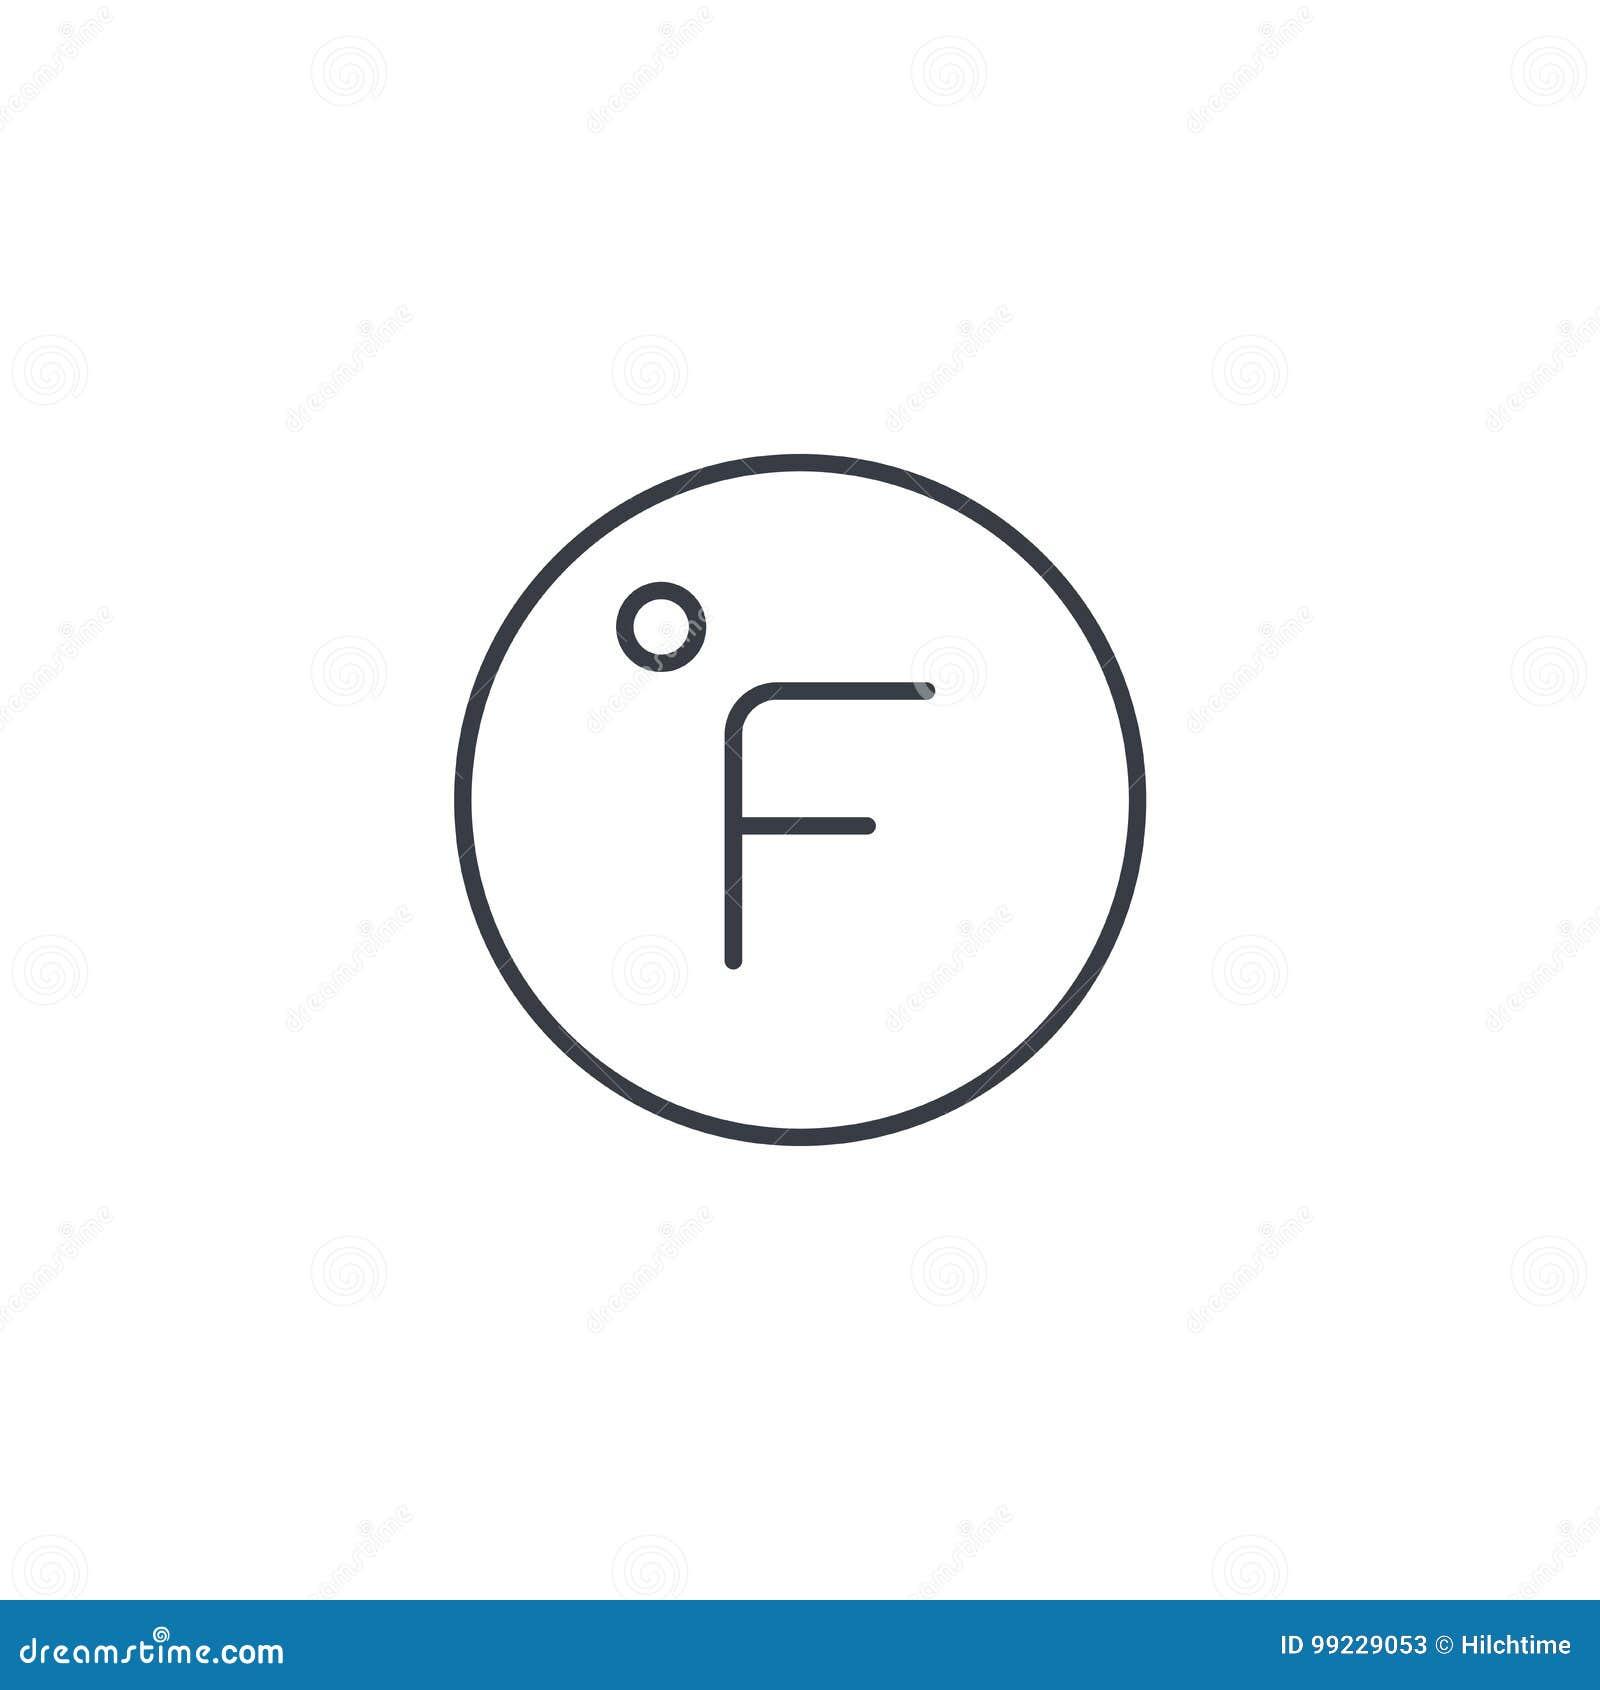 Degree fahrenheit thin line icon linear vector symbol stock degree fahrenheit thin line icon linear vector symbol biocorpaavc Choice Image